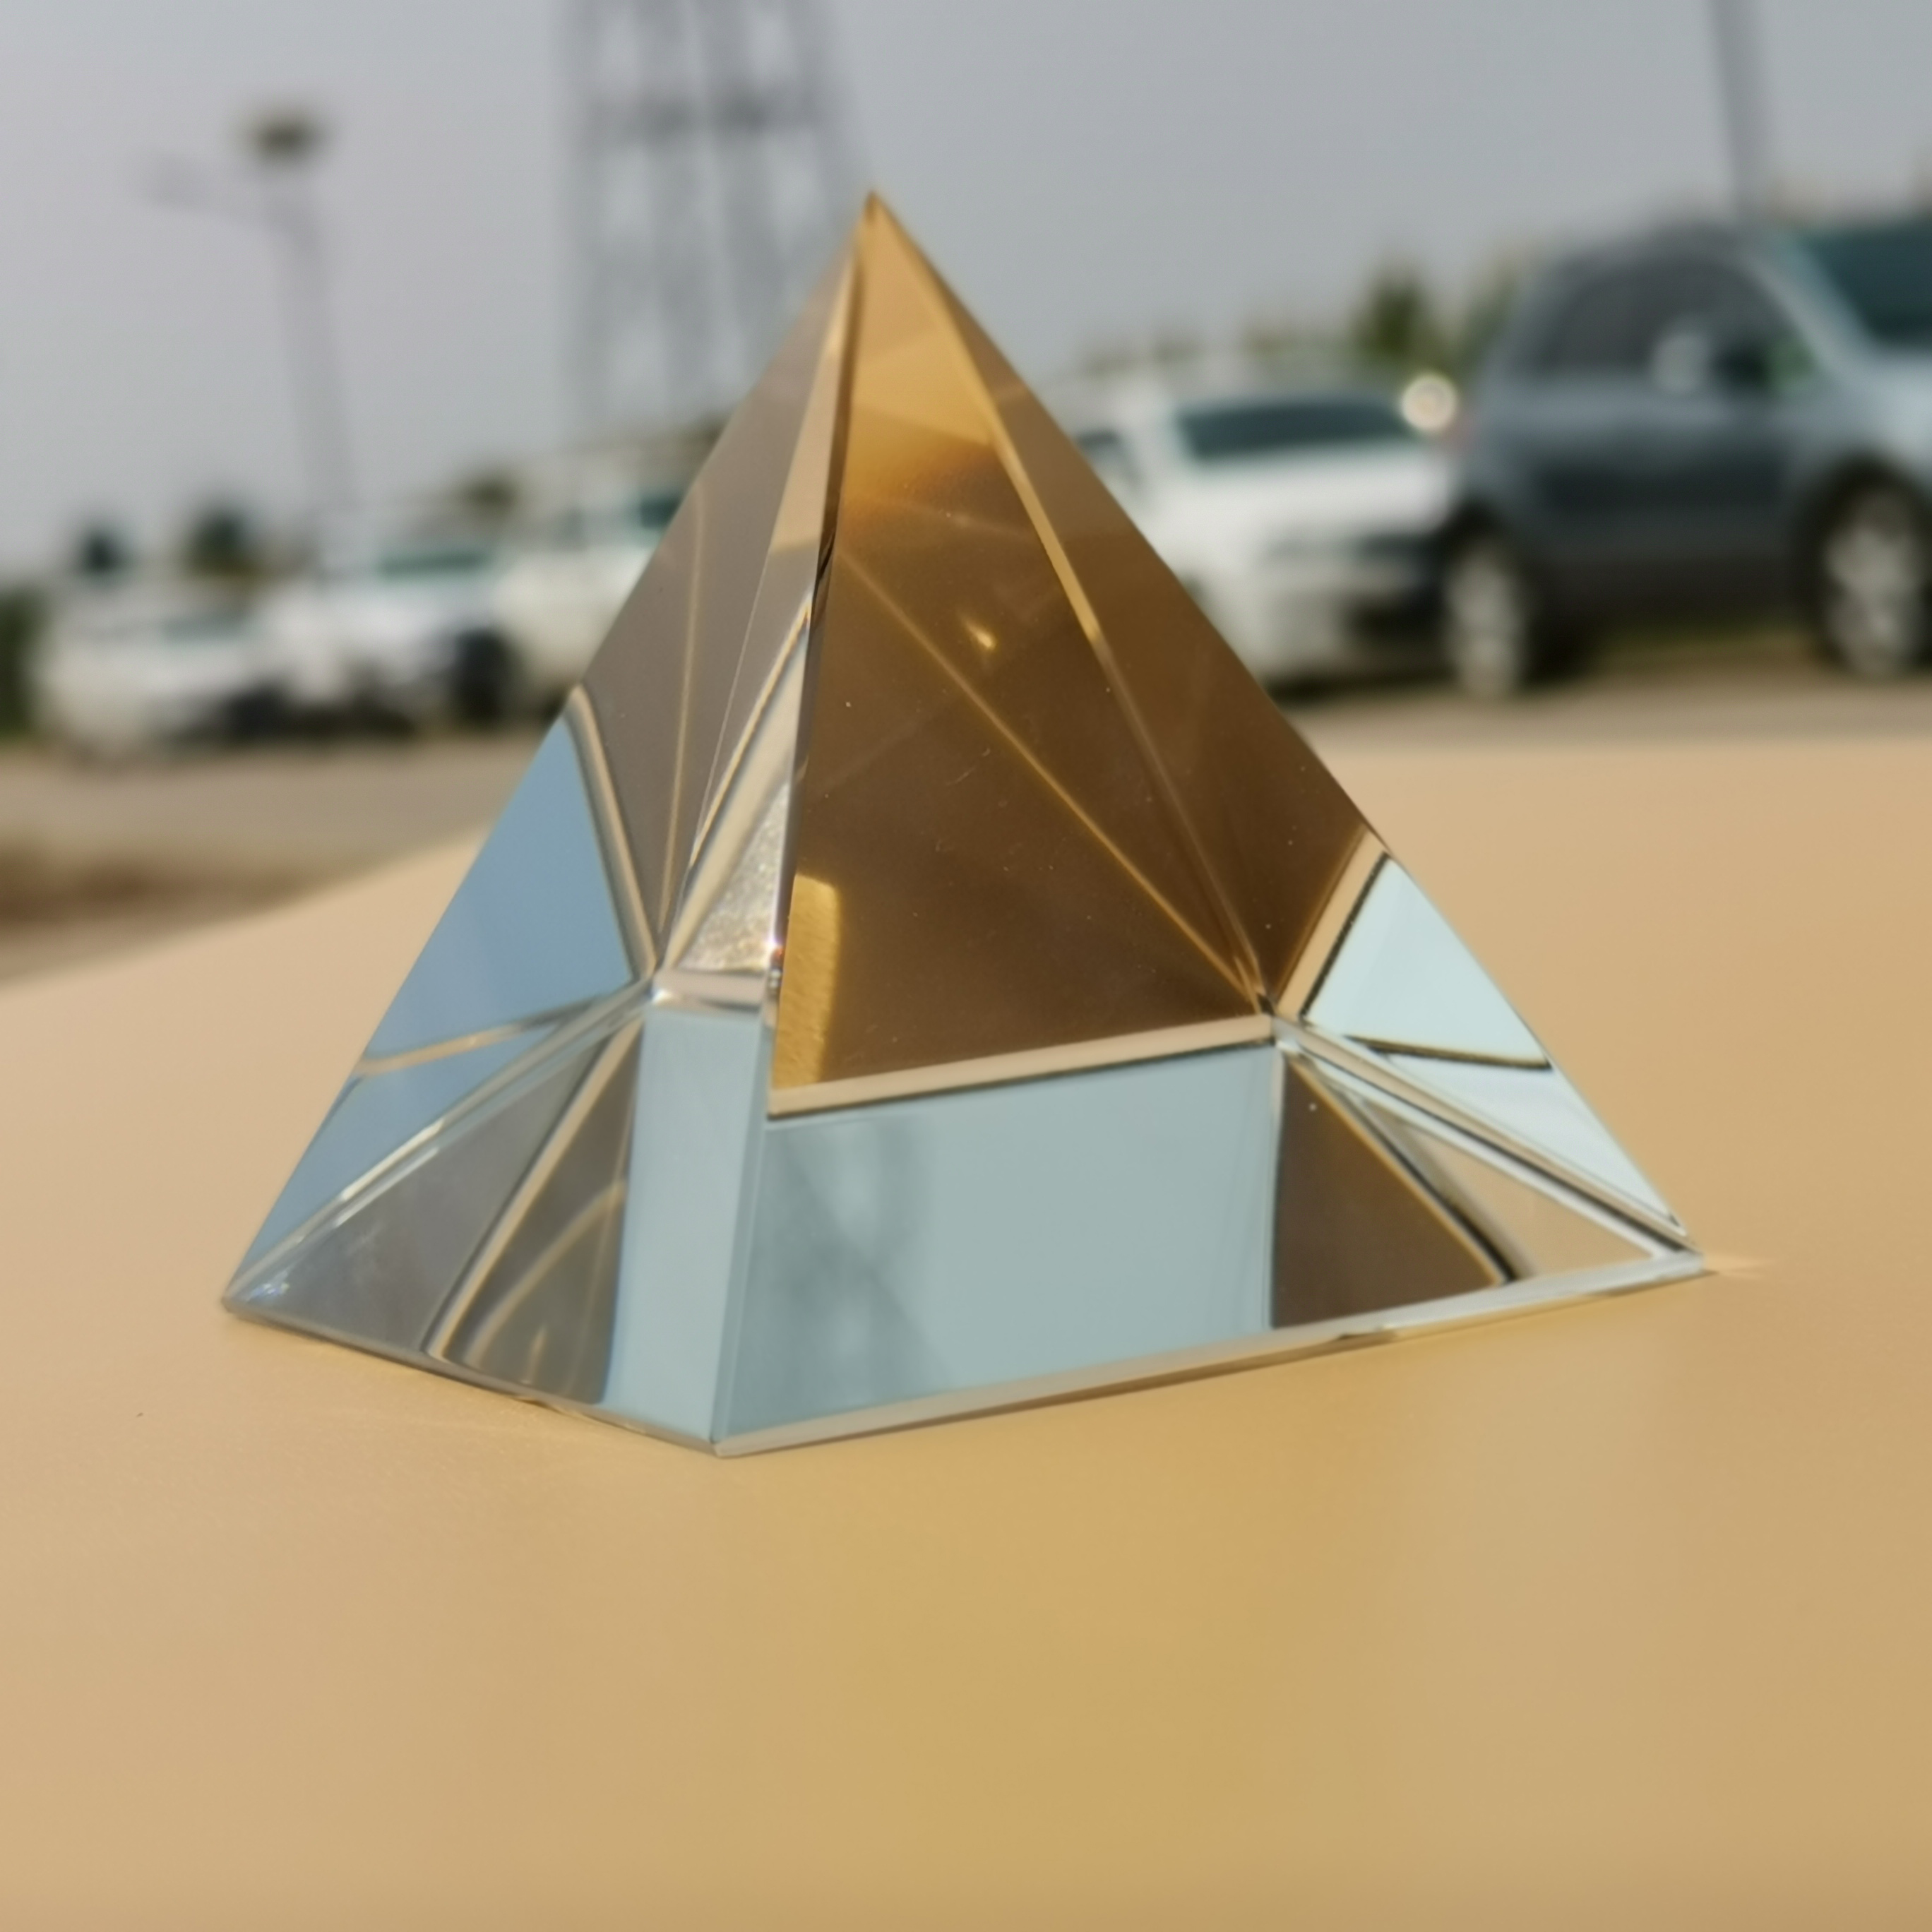 cristal fotografia triângulo luz guia ciência óptica espectrumtools ensino